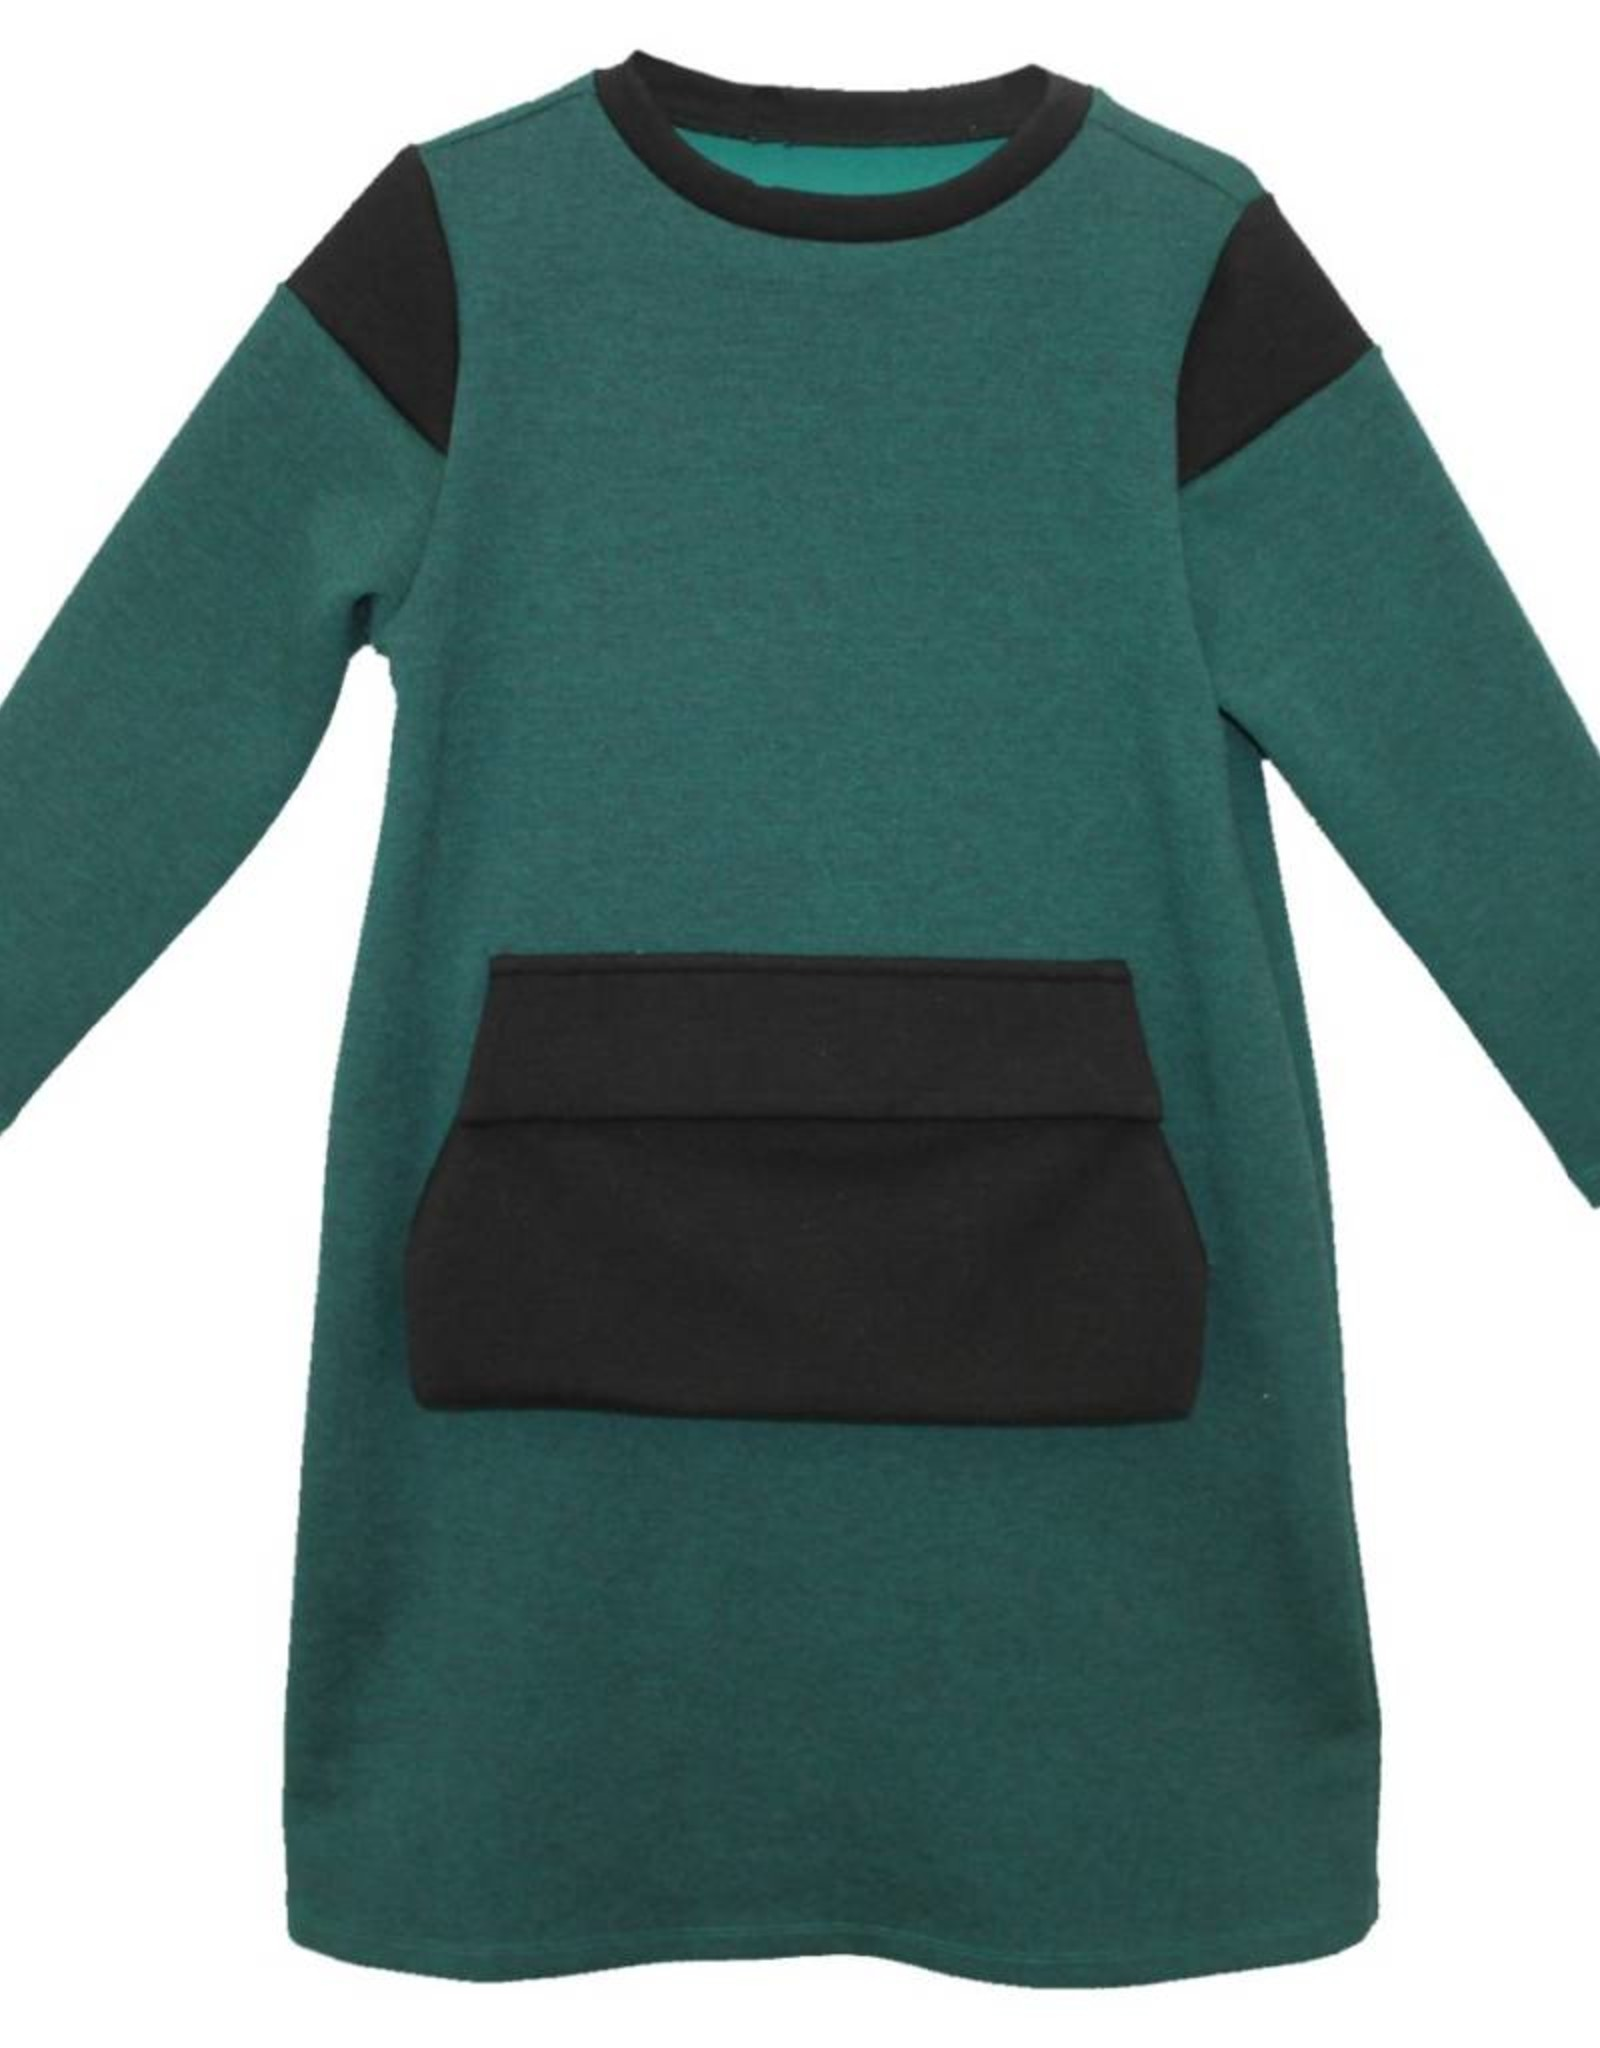 MeMe MeMe Green & Black Pocket Dress